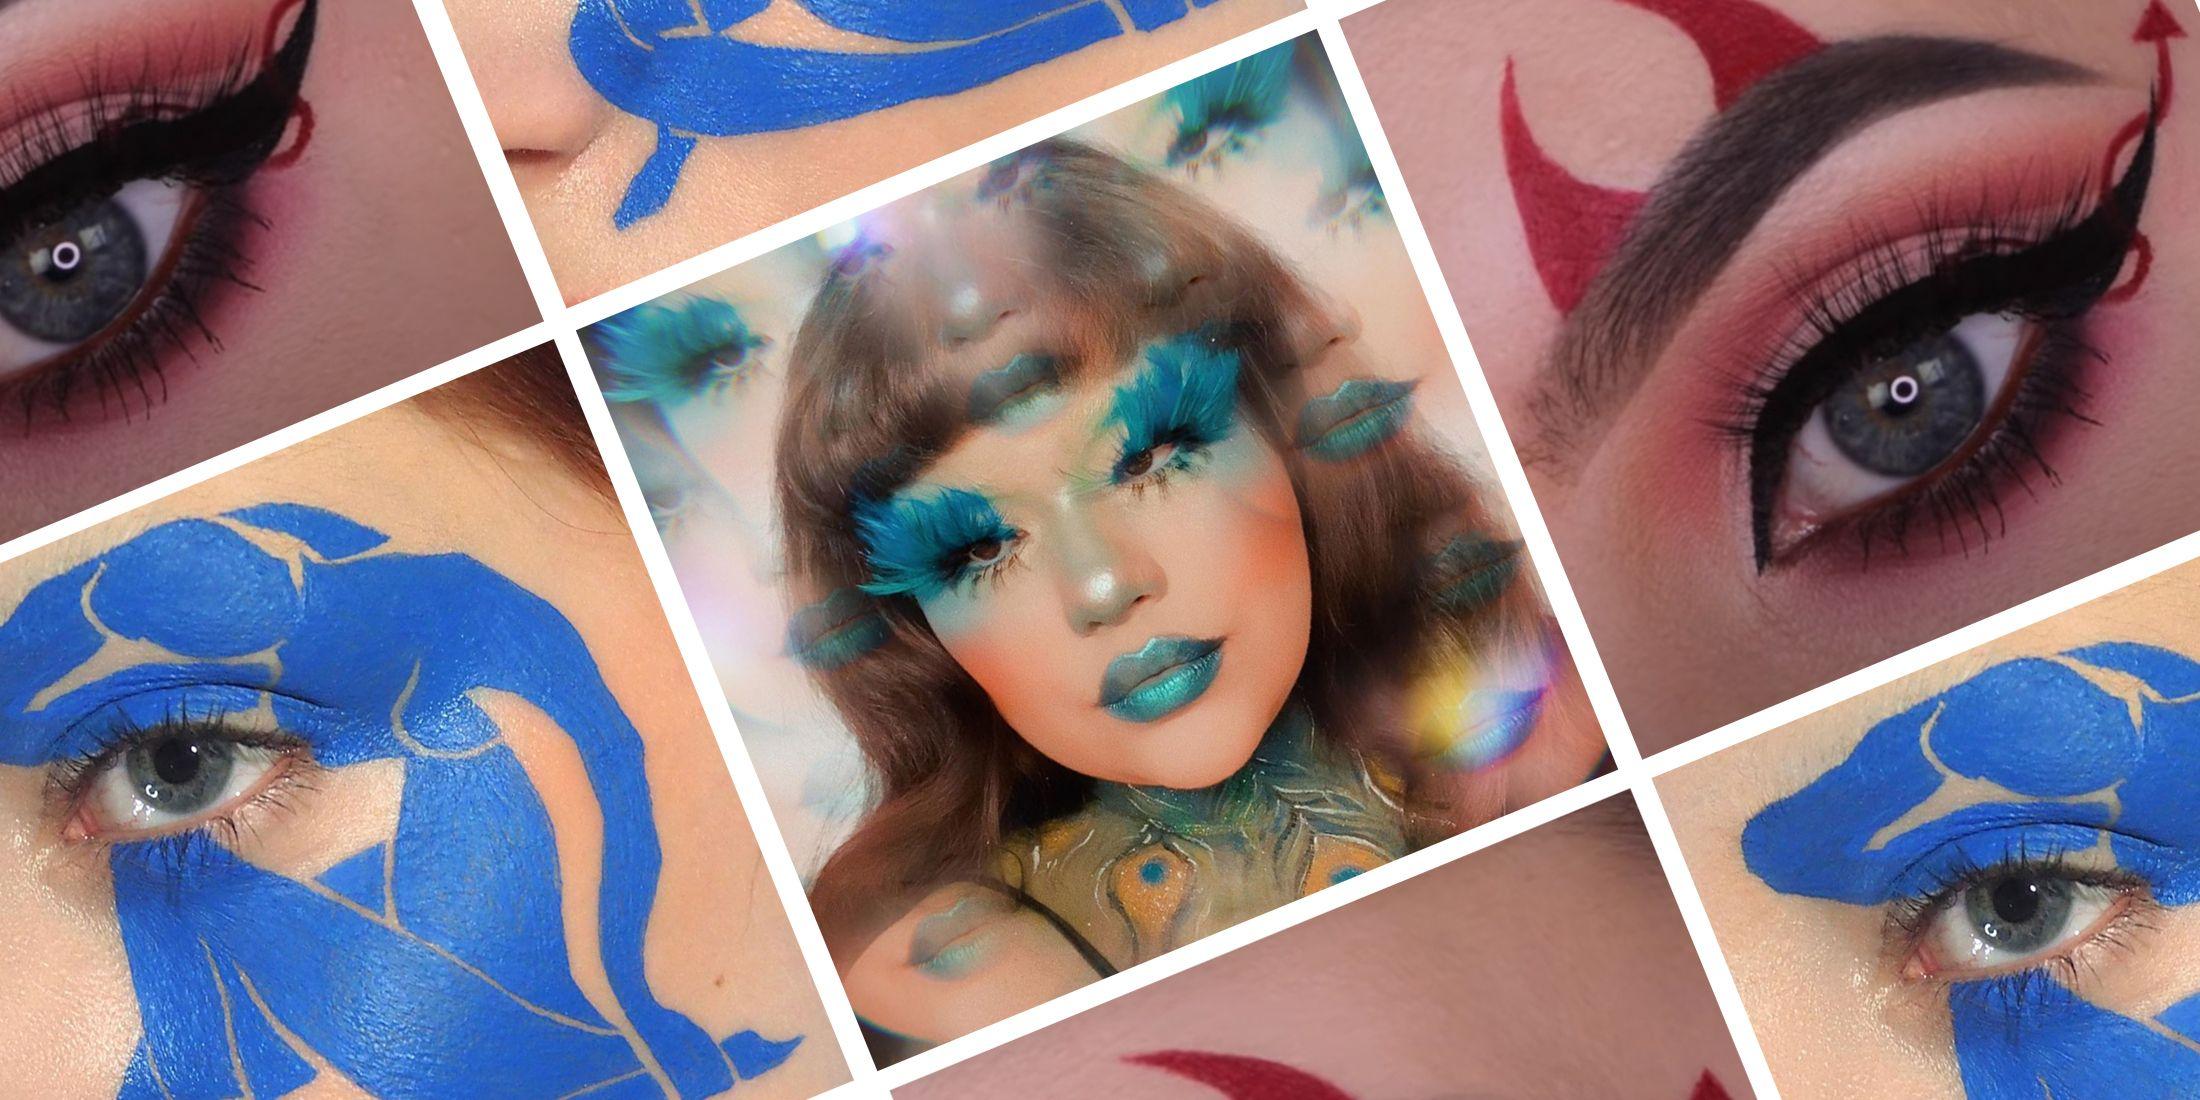 Halloween Inspired Eye Makeup.The Best Halloween Eye Makeup Looks For 2020 Halloween Eye Makeup Ideas